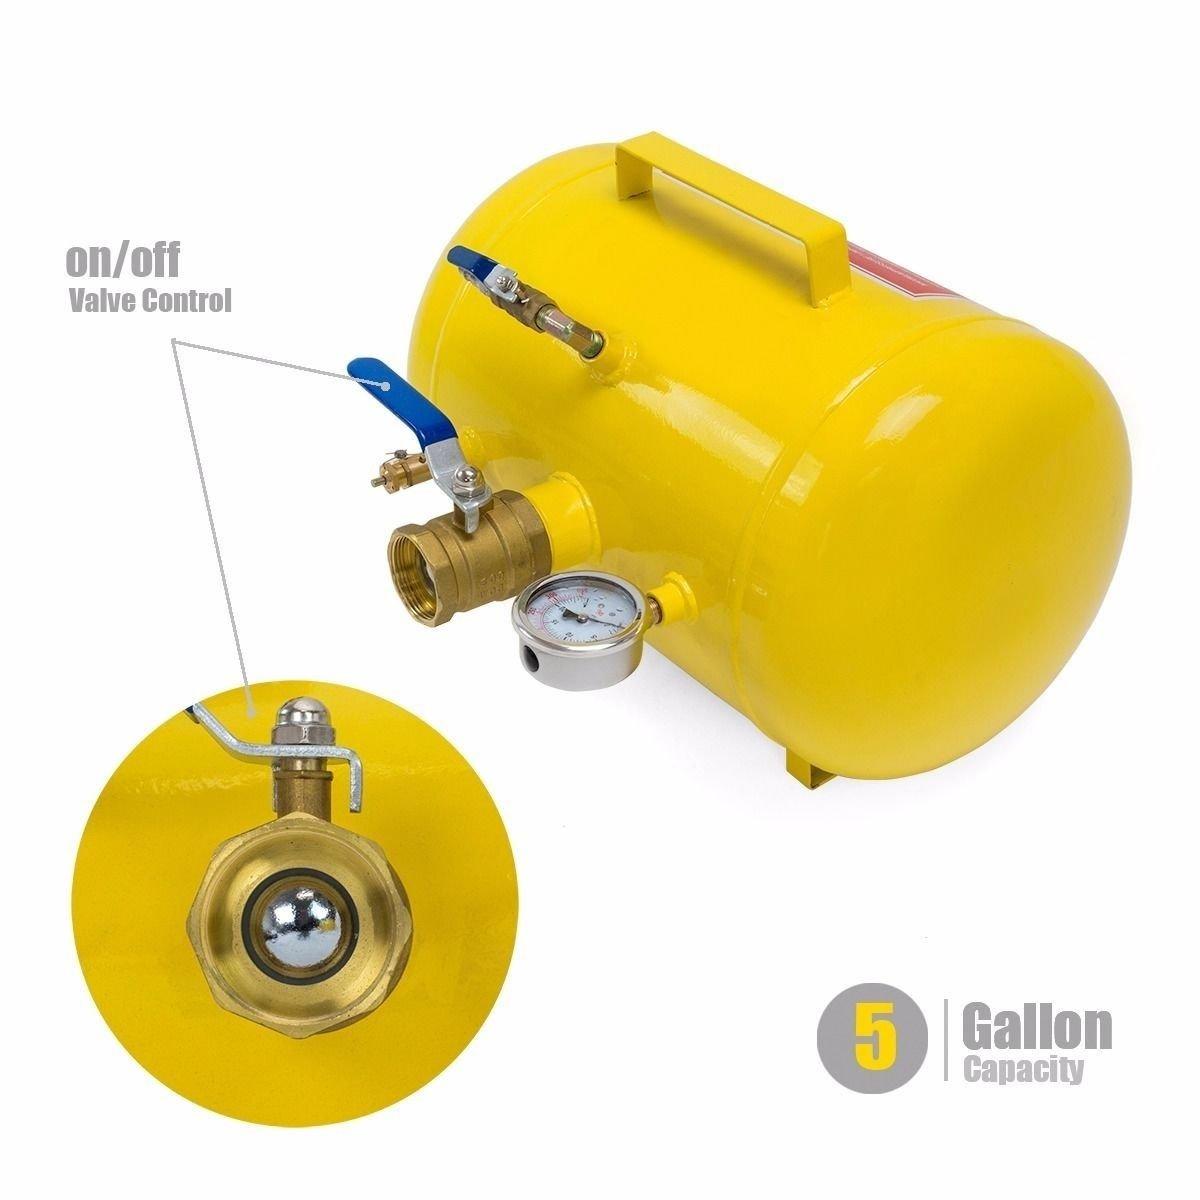 Stark 5 Gal Rapid Inflator Air Bead Seater Tire Tool Pump Wheel Tool Air Operation Pressure Tractor Car Truck ATV Seating (5 Gallon) Capacity by STKUSA (Image #6)